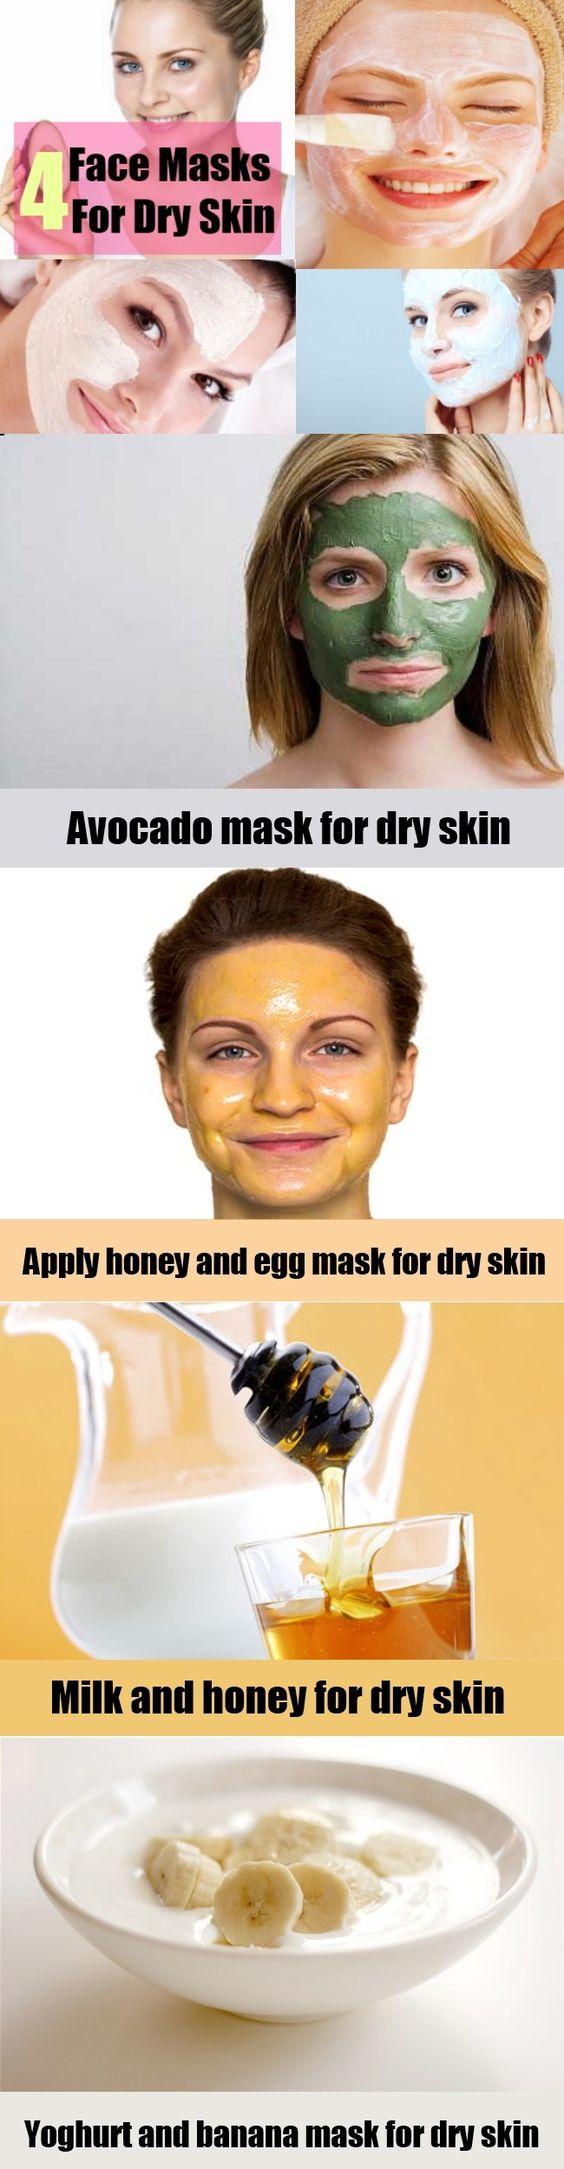 Natural Face Masks For Dry Skin  Facial Care  Pinterest  Natural